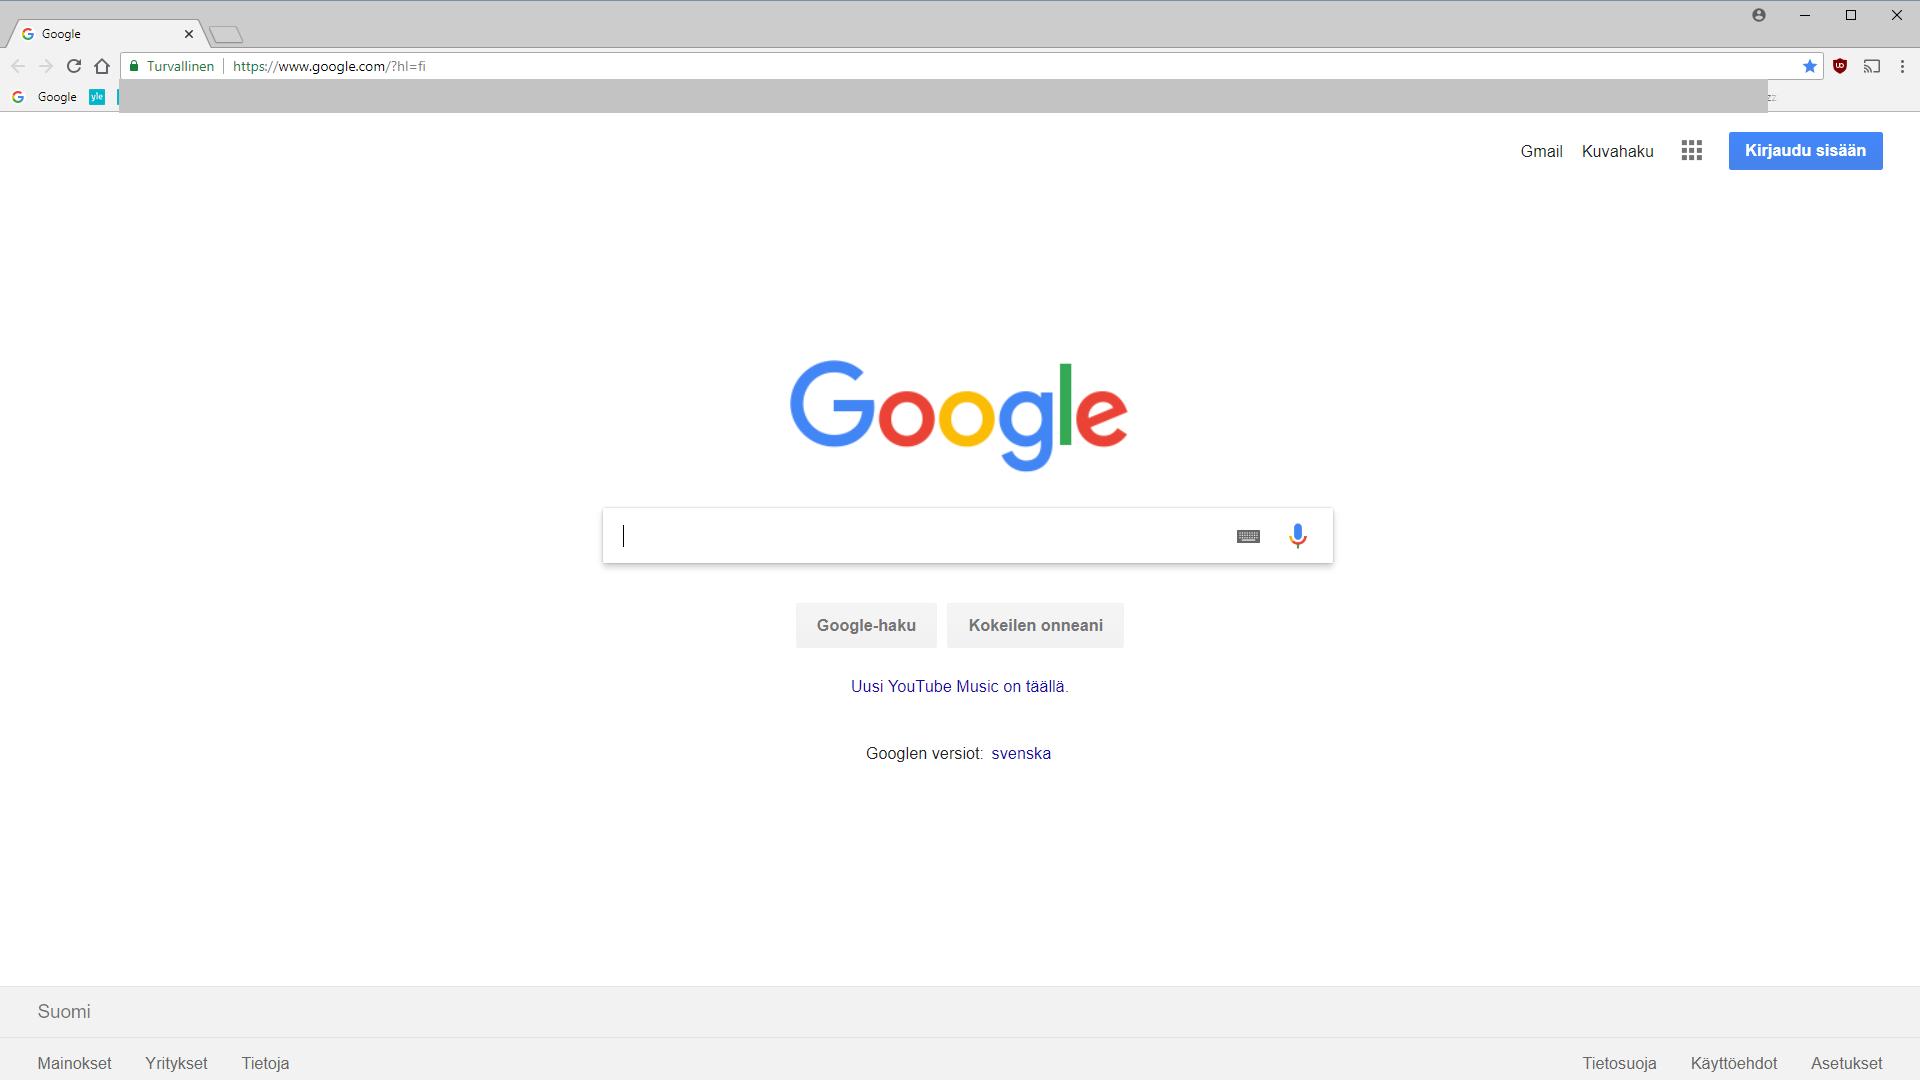 Google - Google Chrome 24.7.2018 9_45_45.